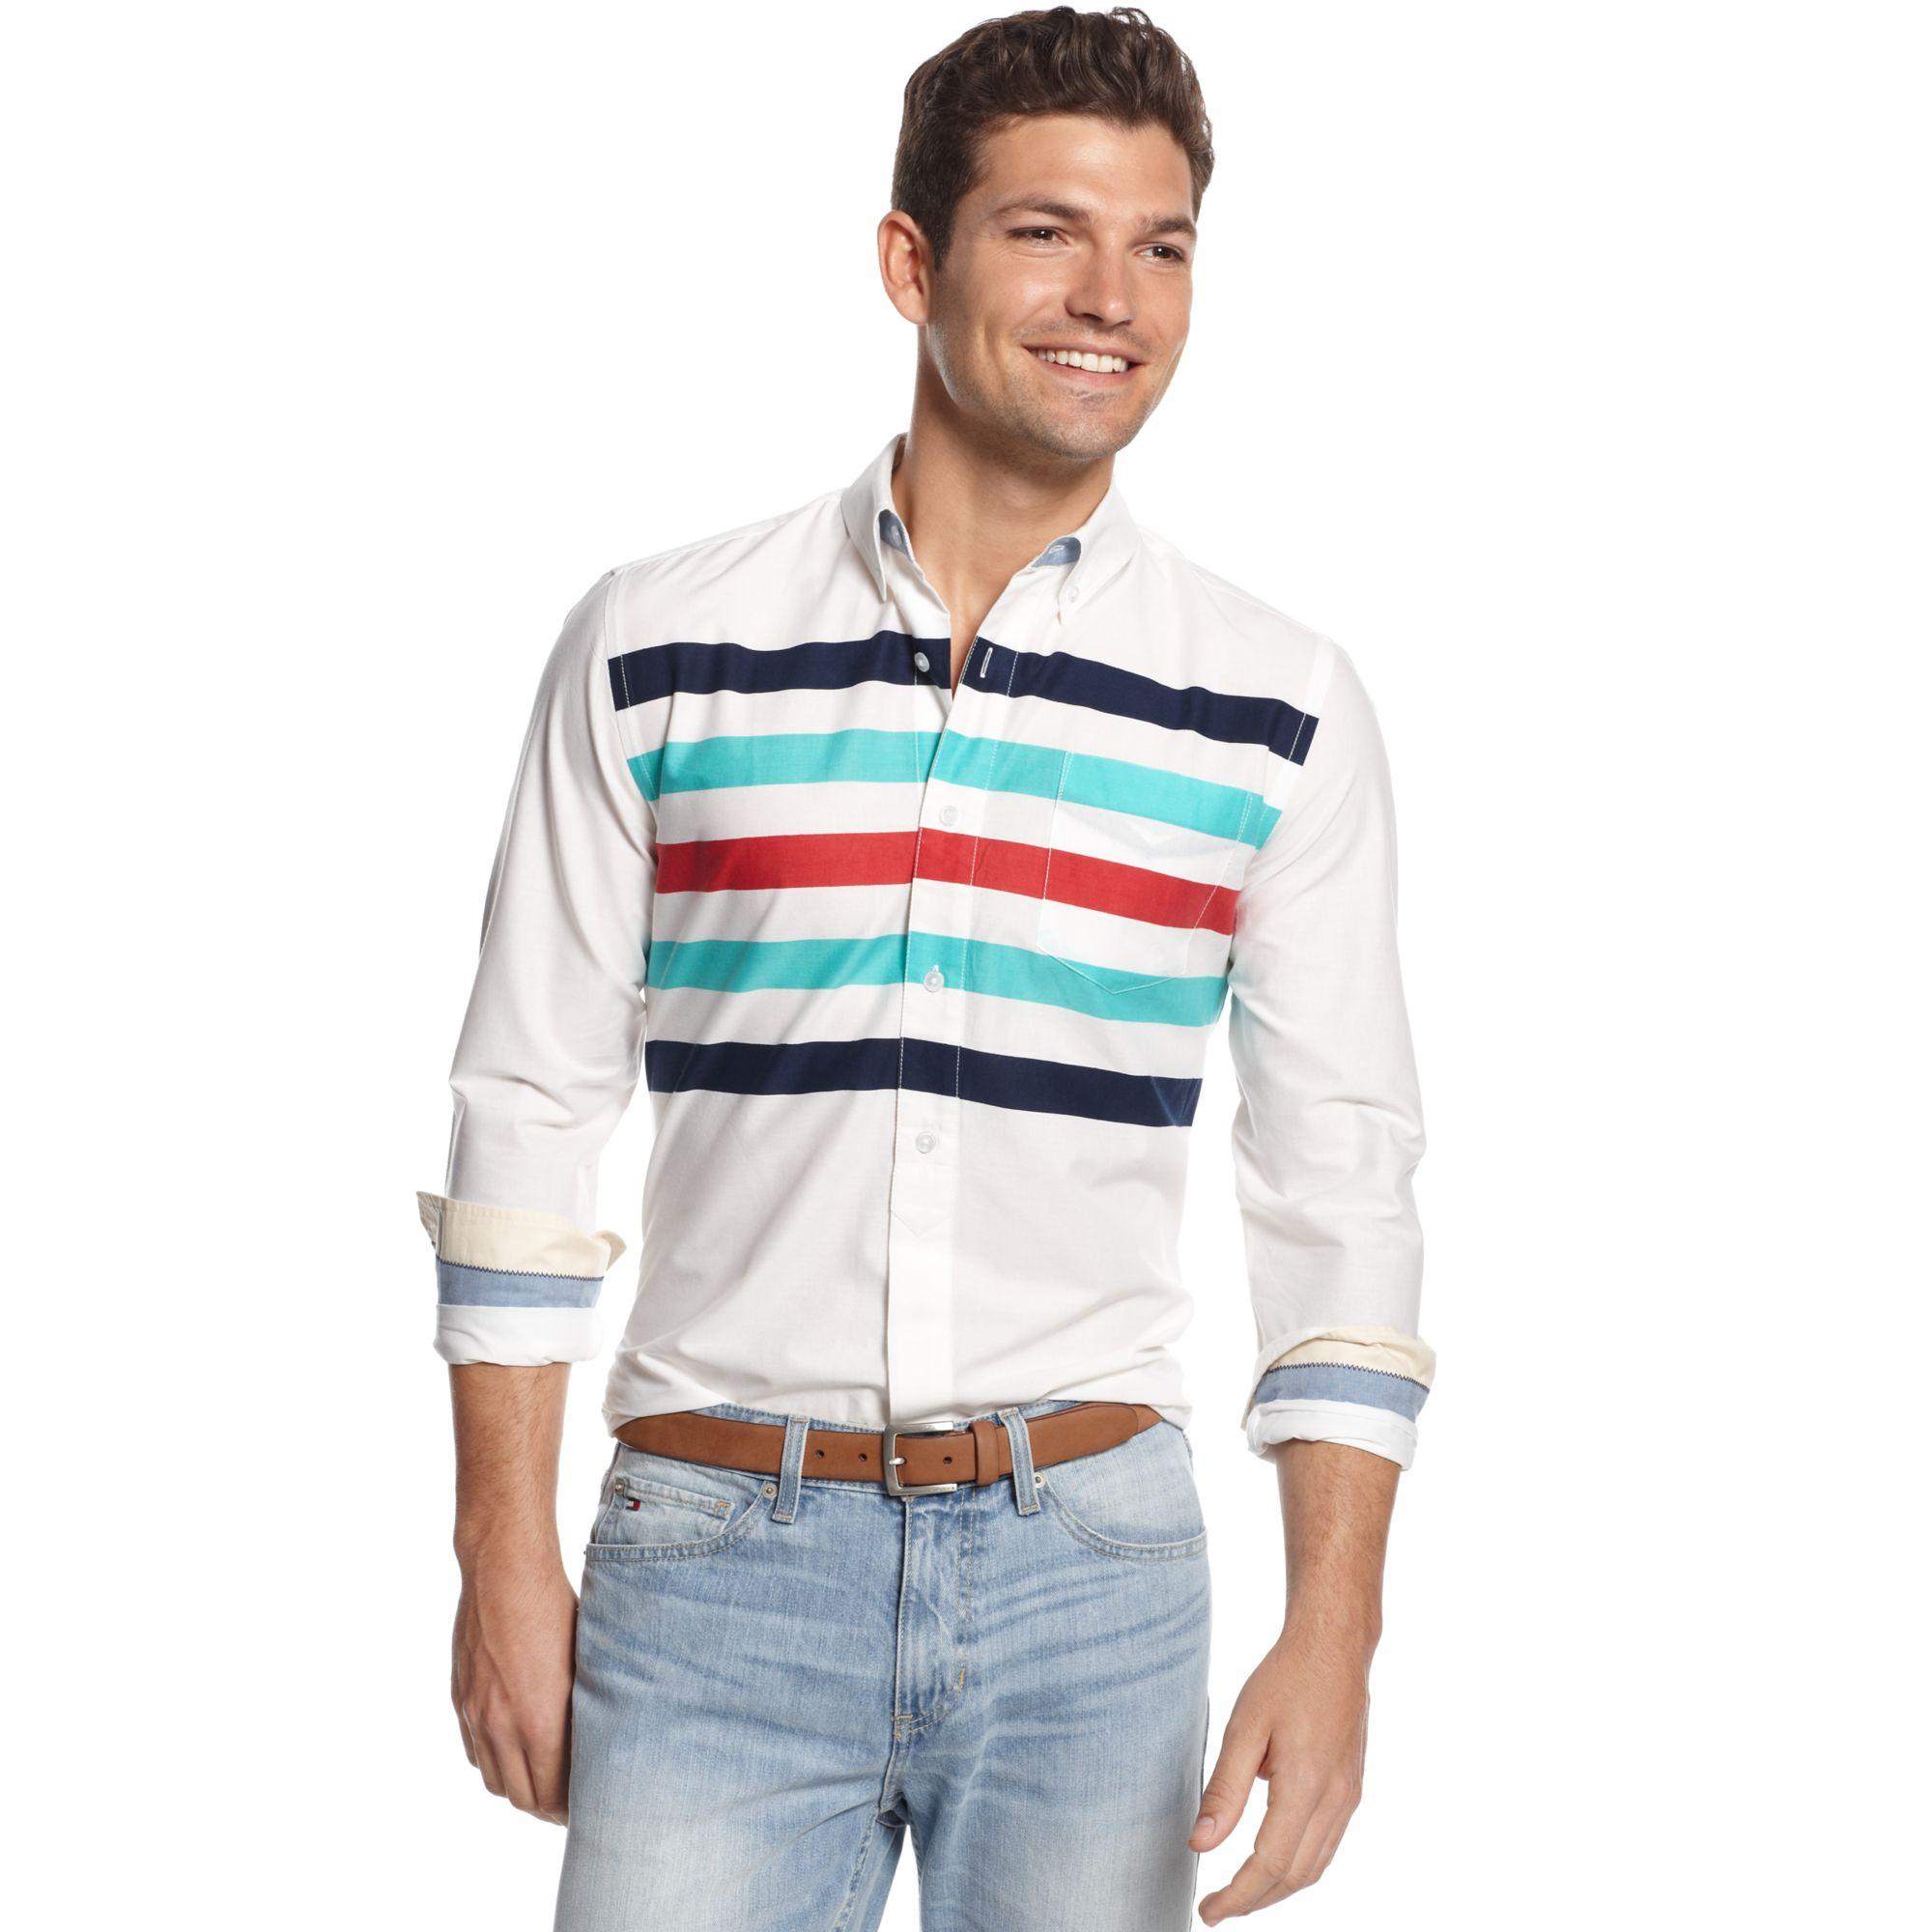 Tommy Hilfiger Laguna Horizon Customfit Shirt In